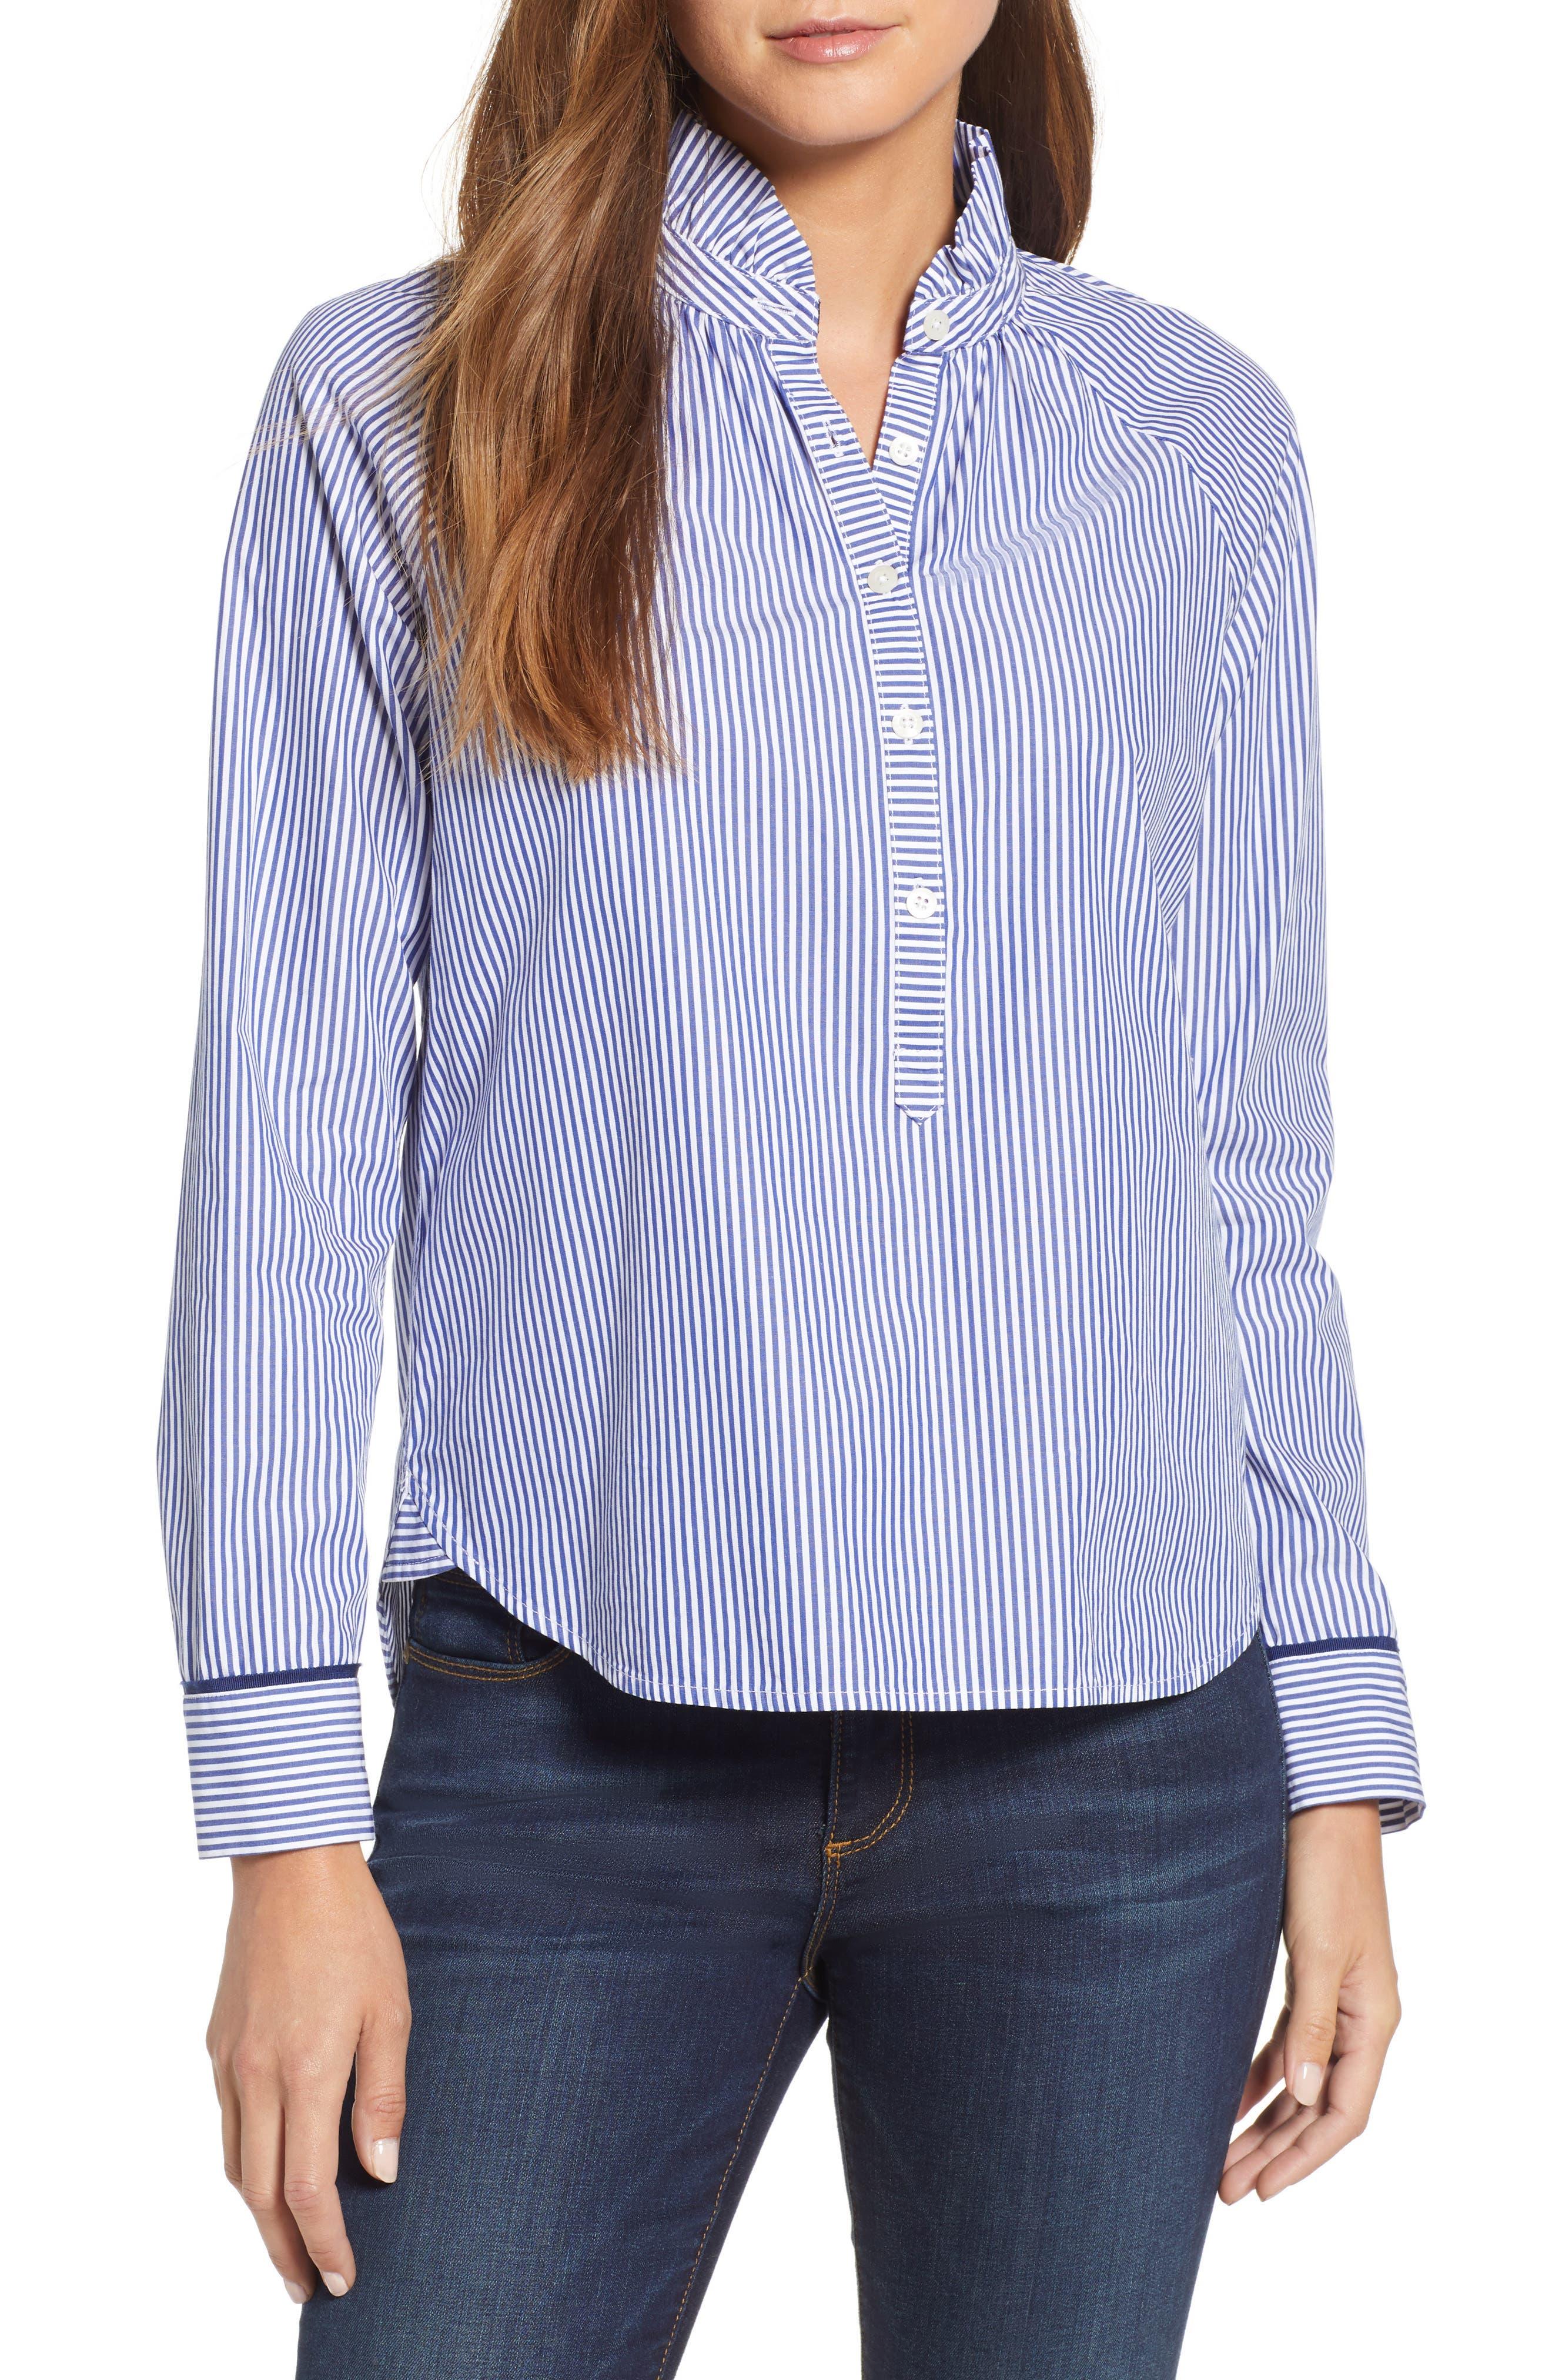 VINEYARD VINES Stripe Ruffle Shirt, Main, color, 474